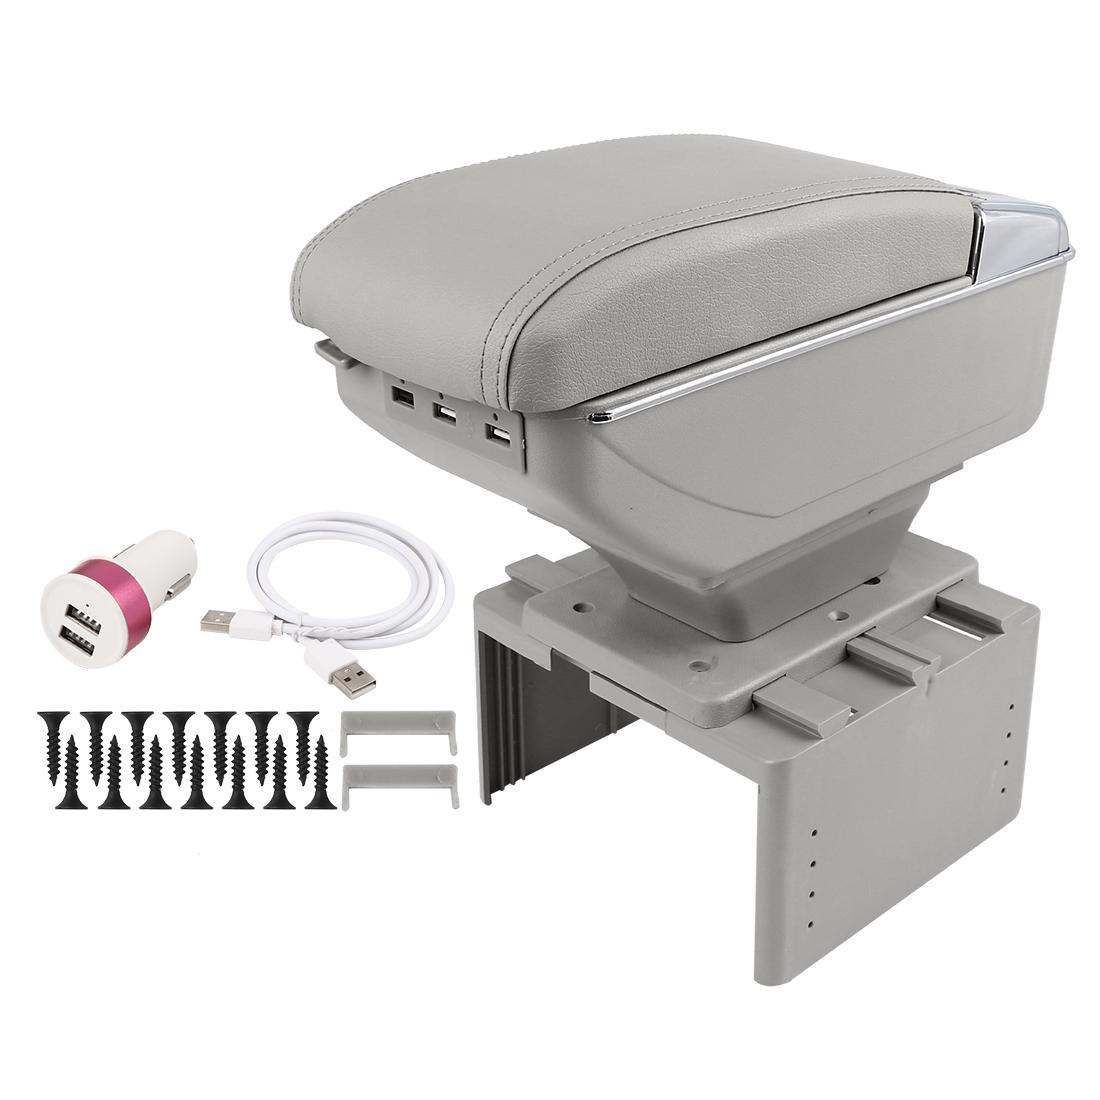 Chargeable Adjustable Single Layer Design Car Center Armrest Box w/ LED 7 USB